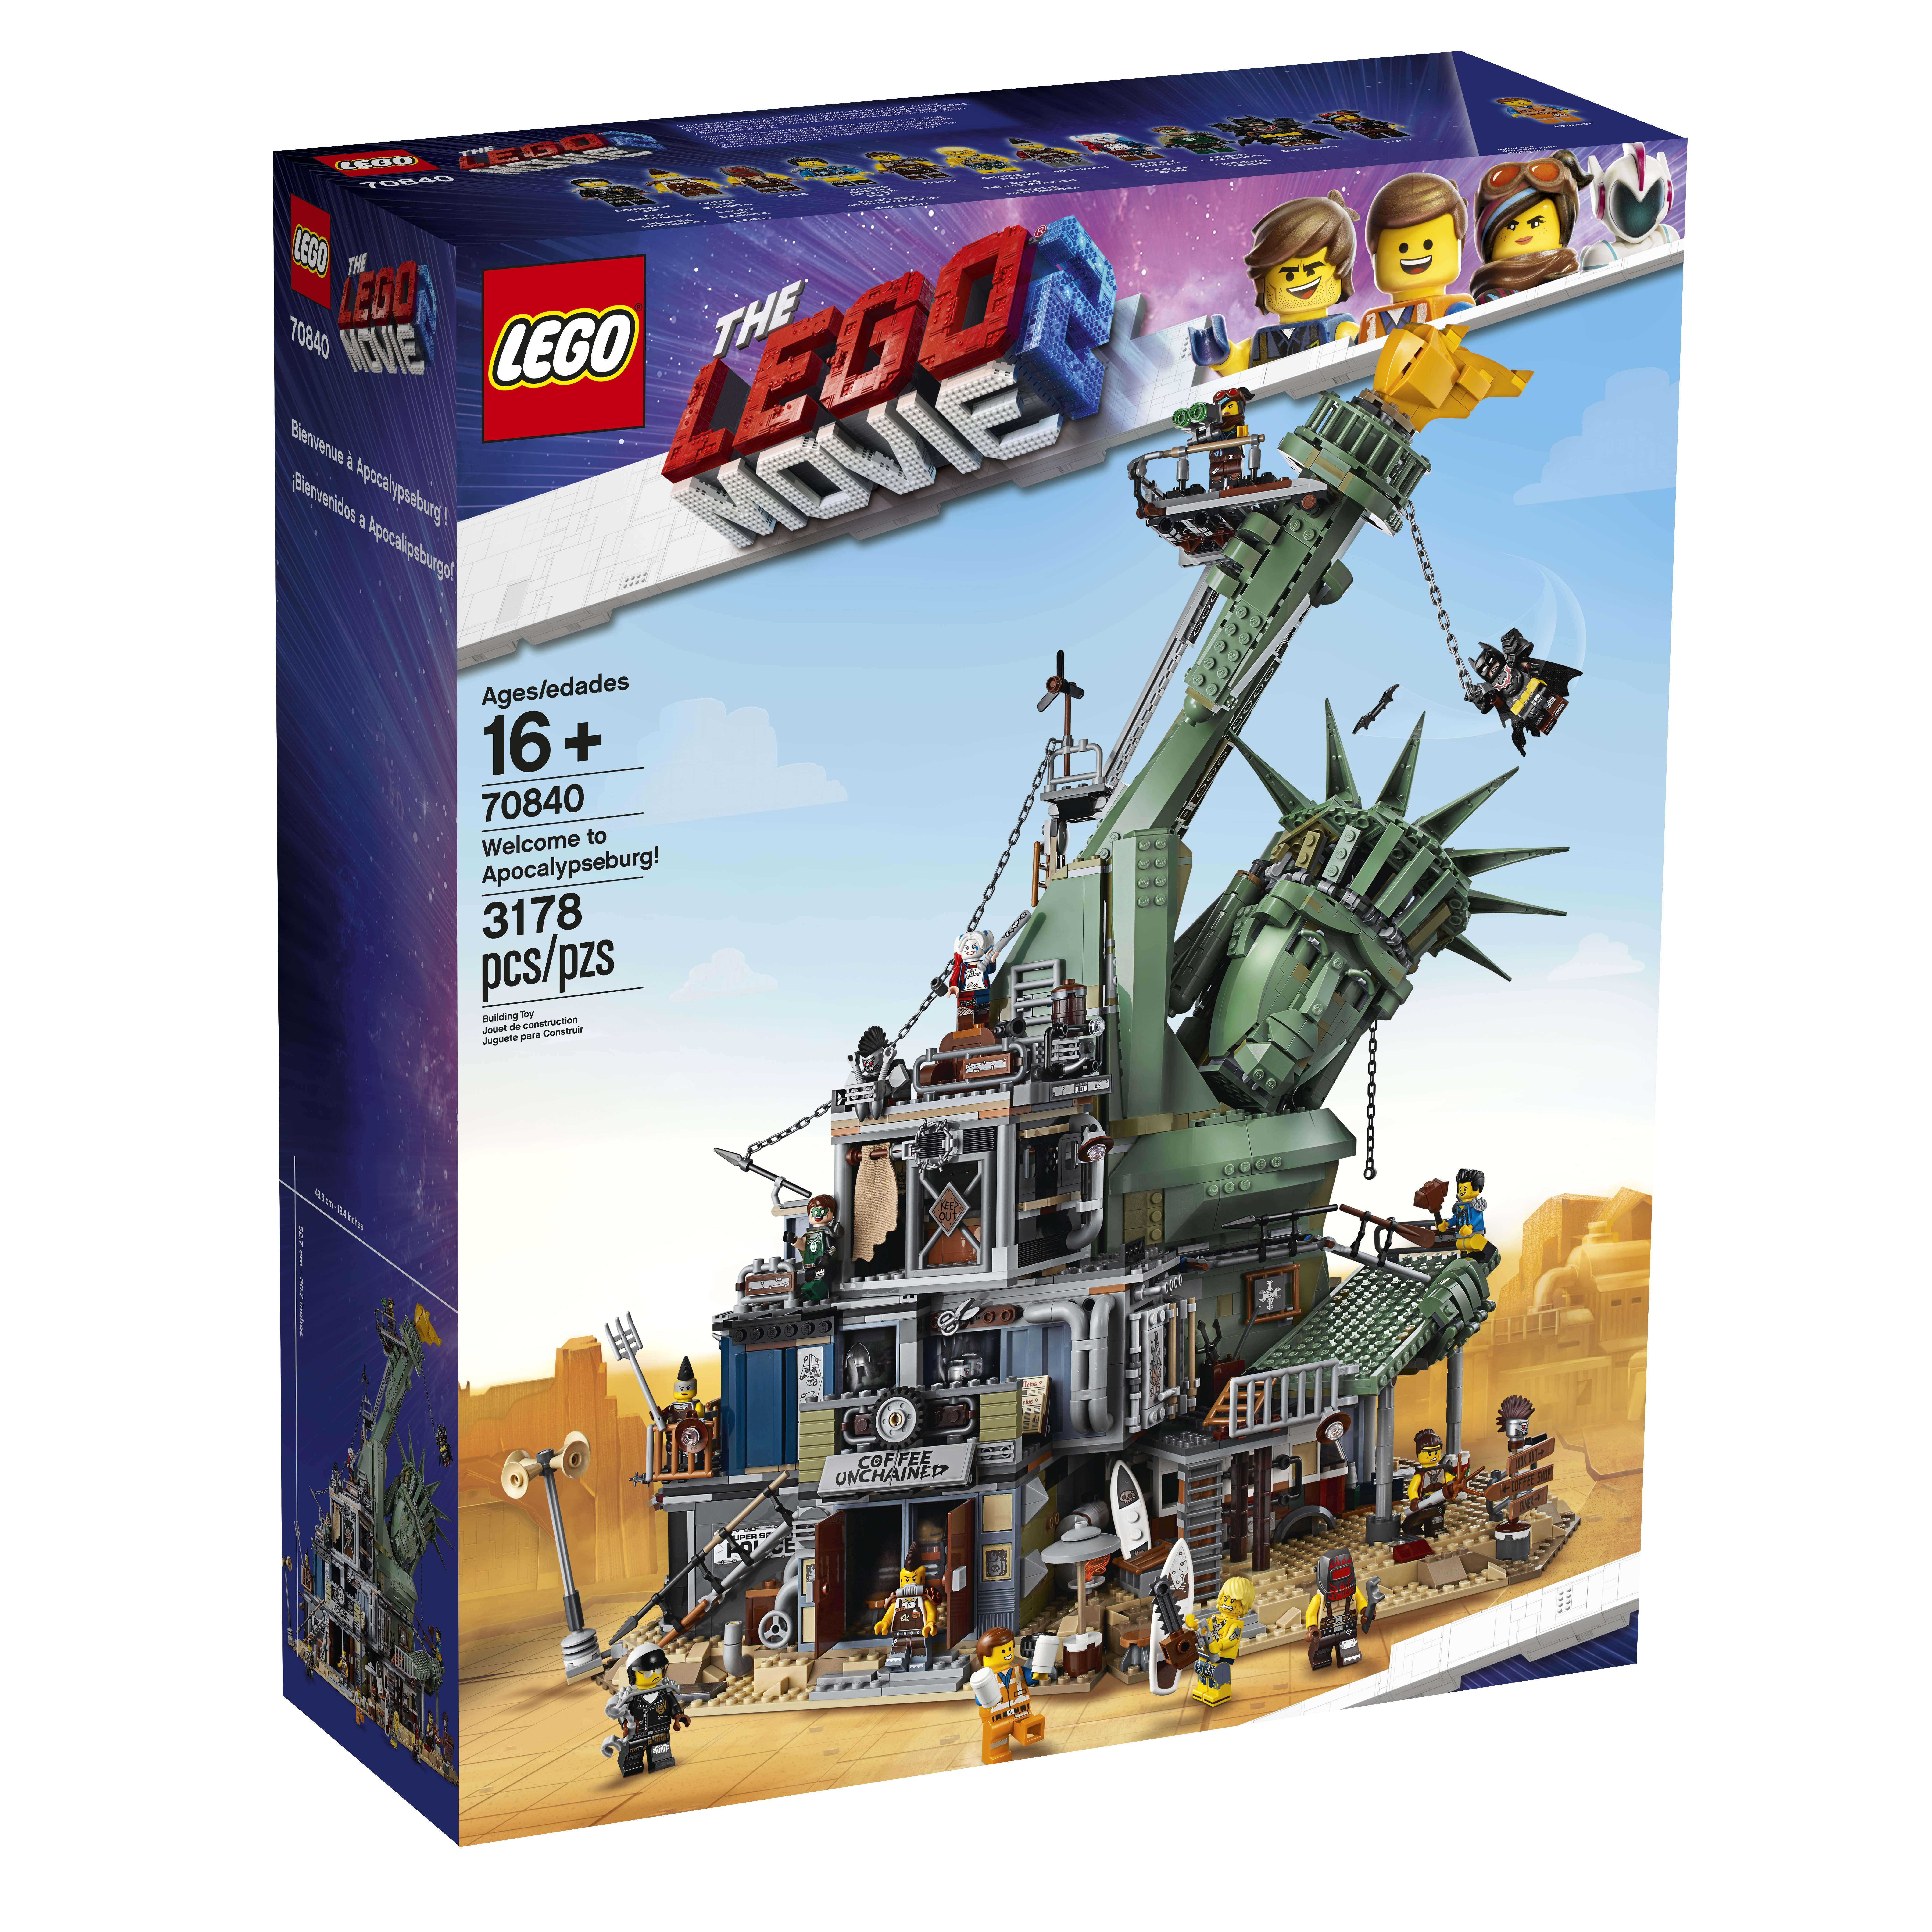 Lego 70840 - Welcome to Apocalypseburg! | i Brick City